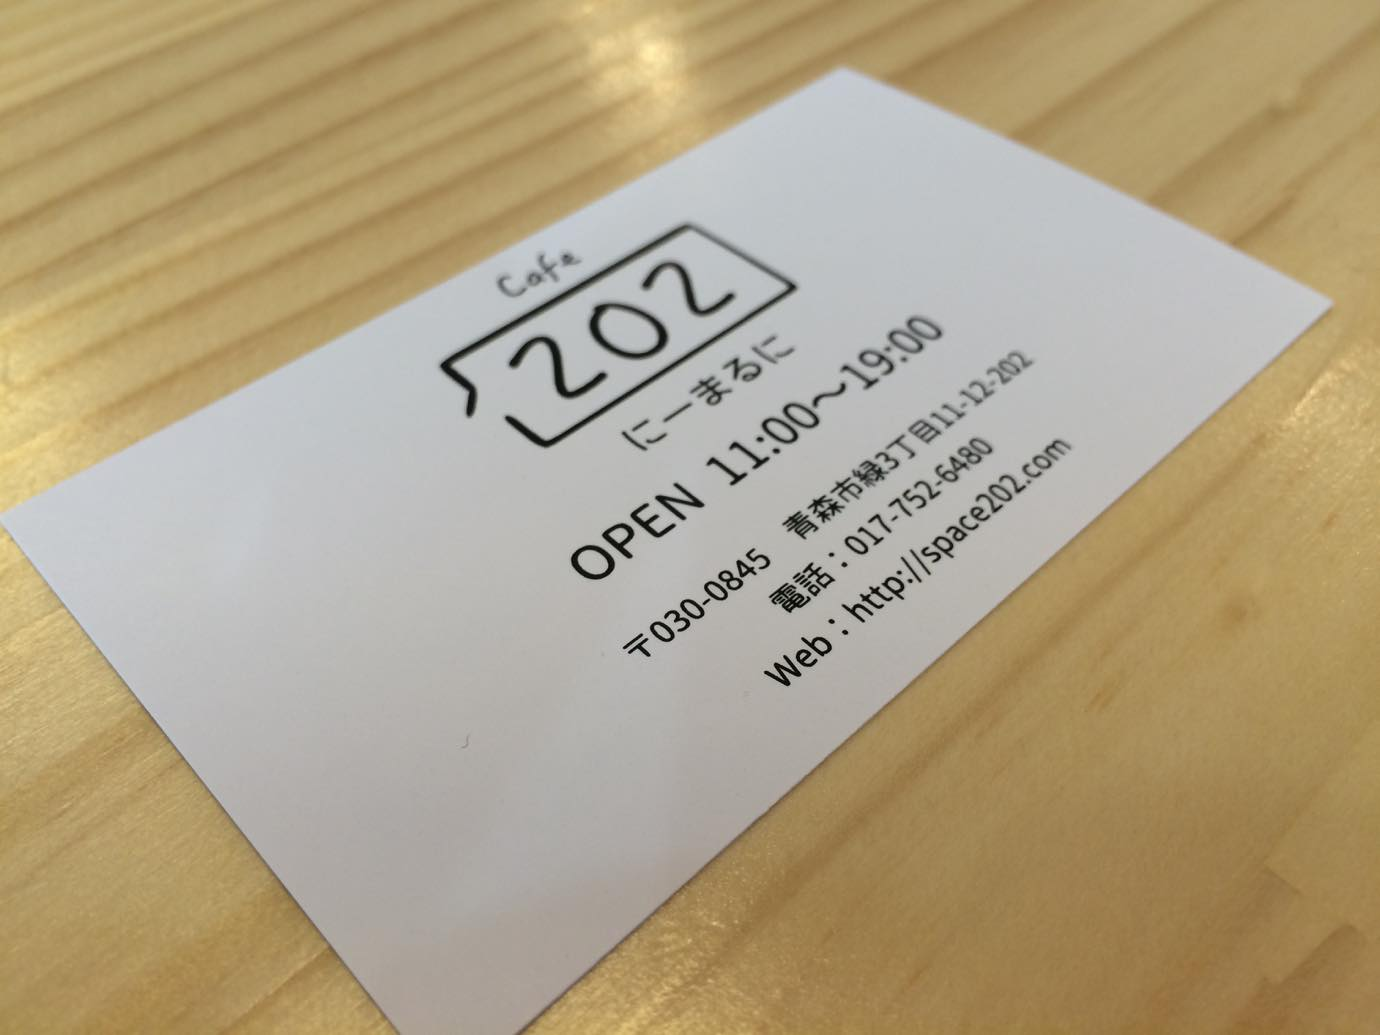 Cafe202 05 20150425 123754